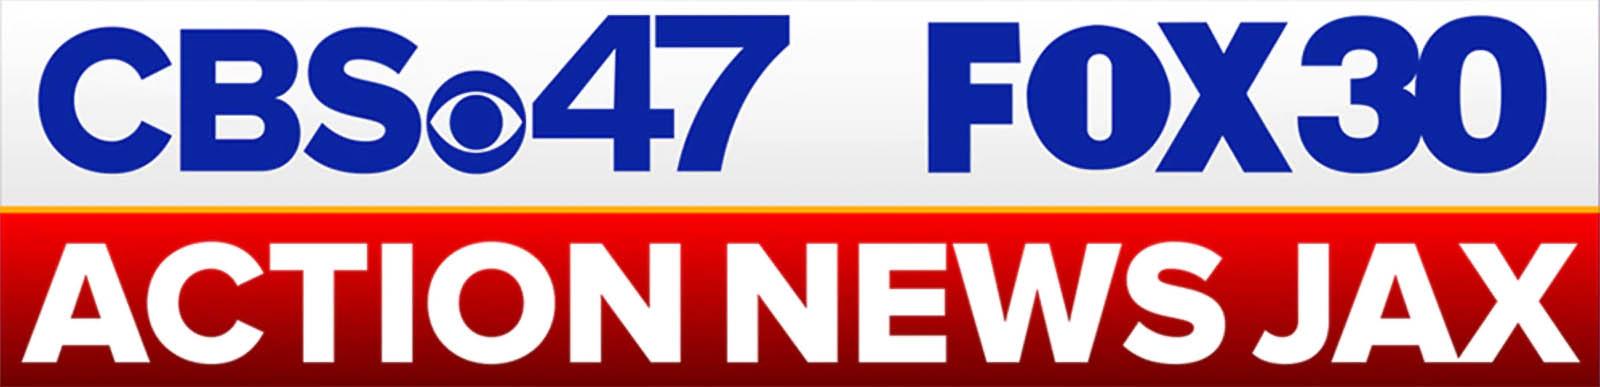 Action News Jax logo